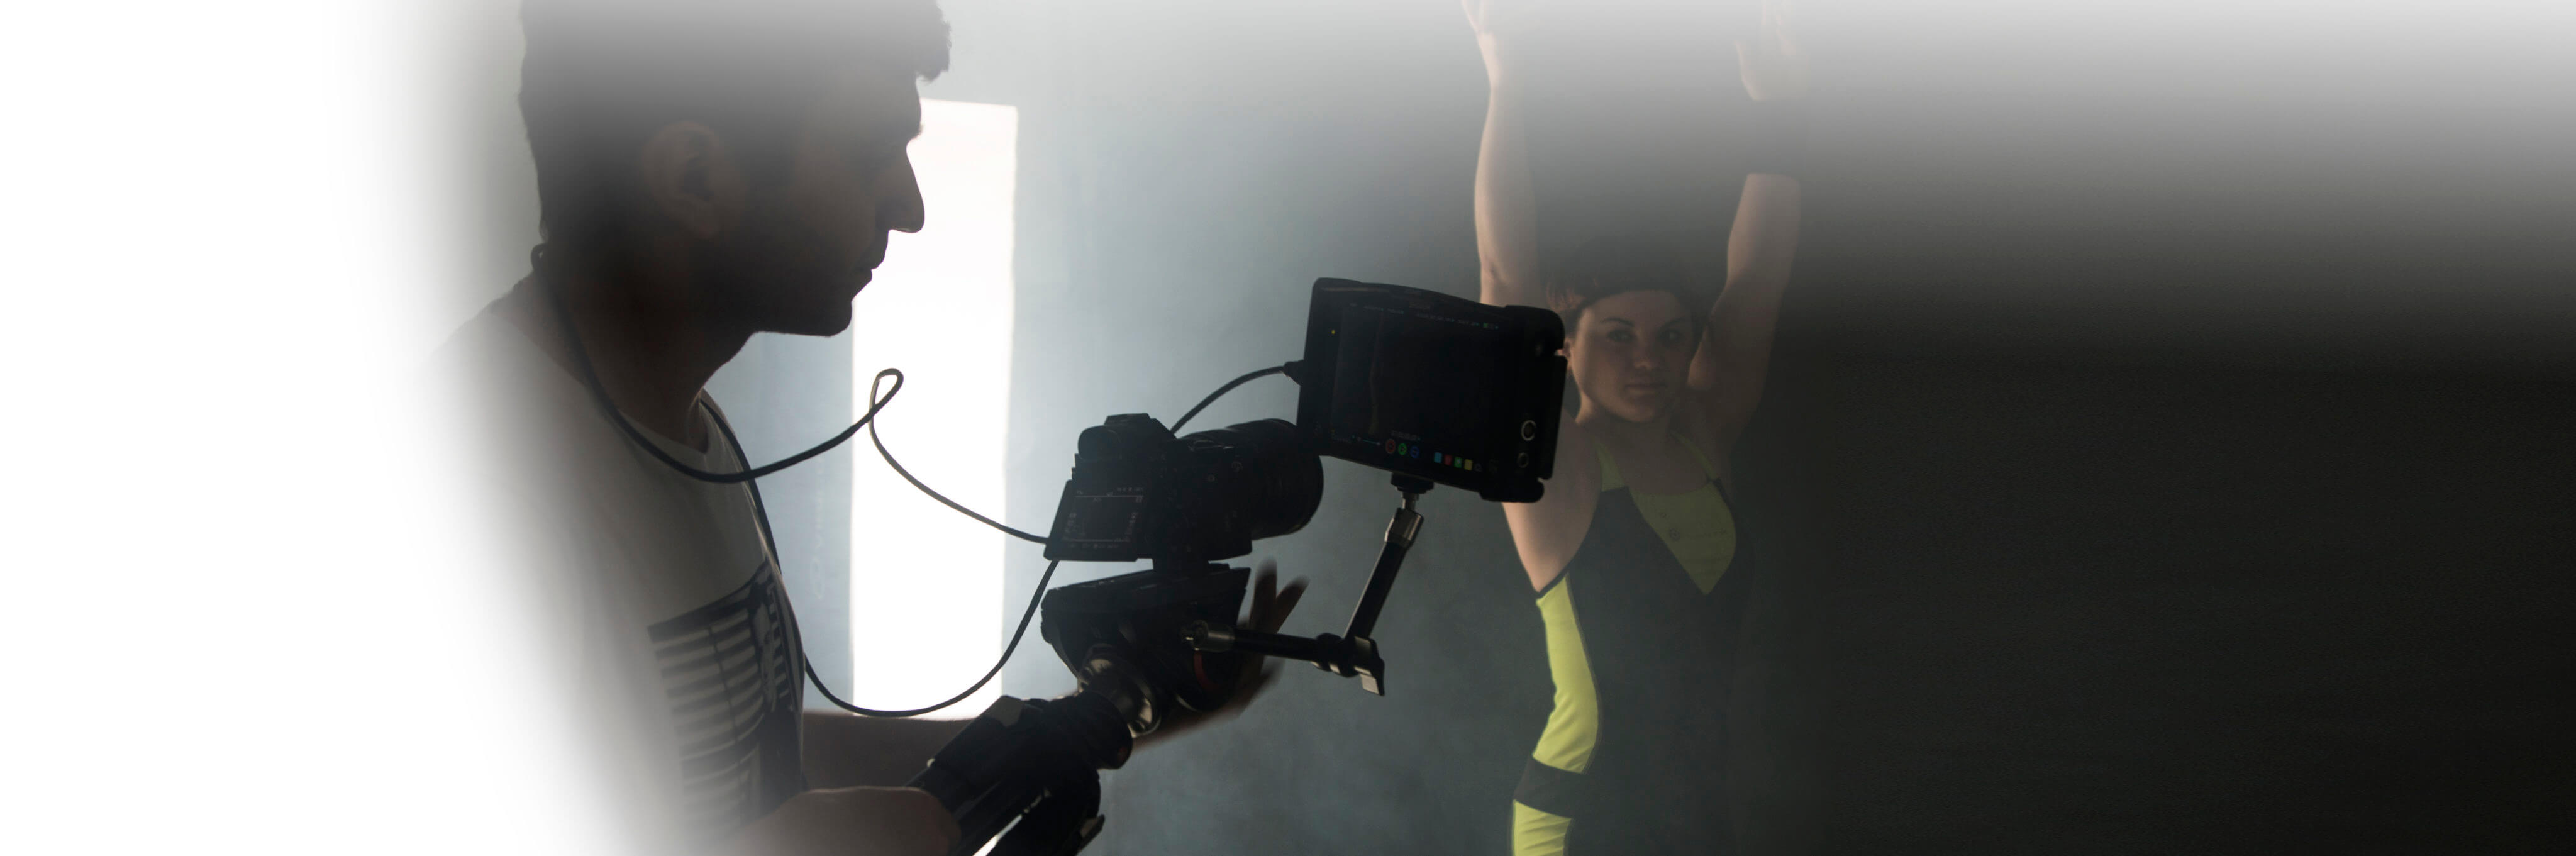 http://winterfilm.ru/wp-content/uploads/2018/10/img_6743-2i-1-e1539971330564.jpg